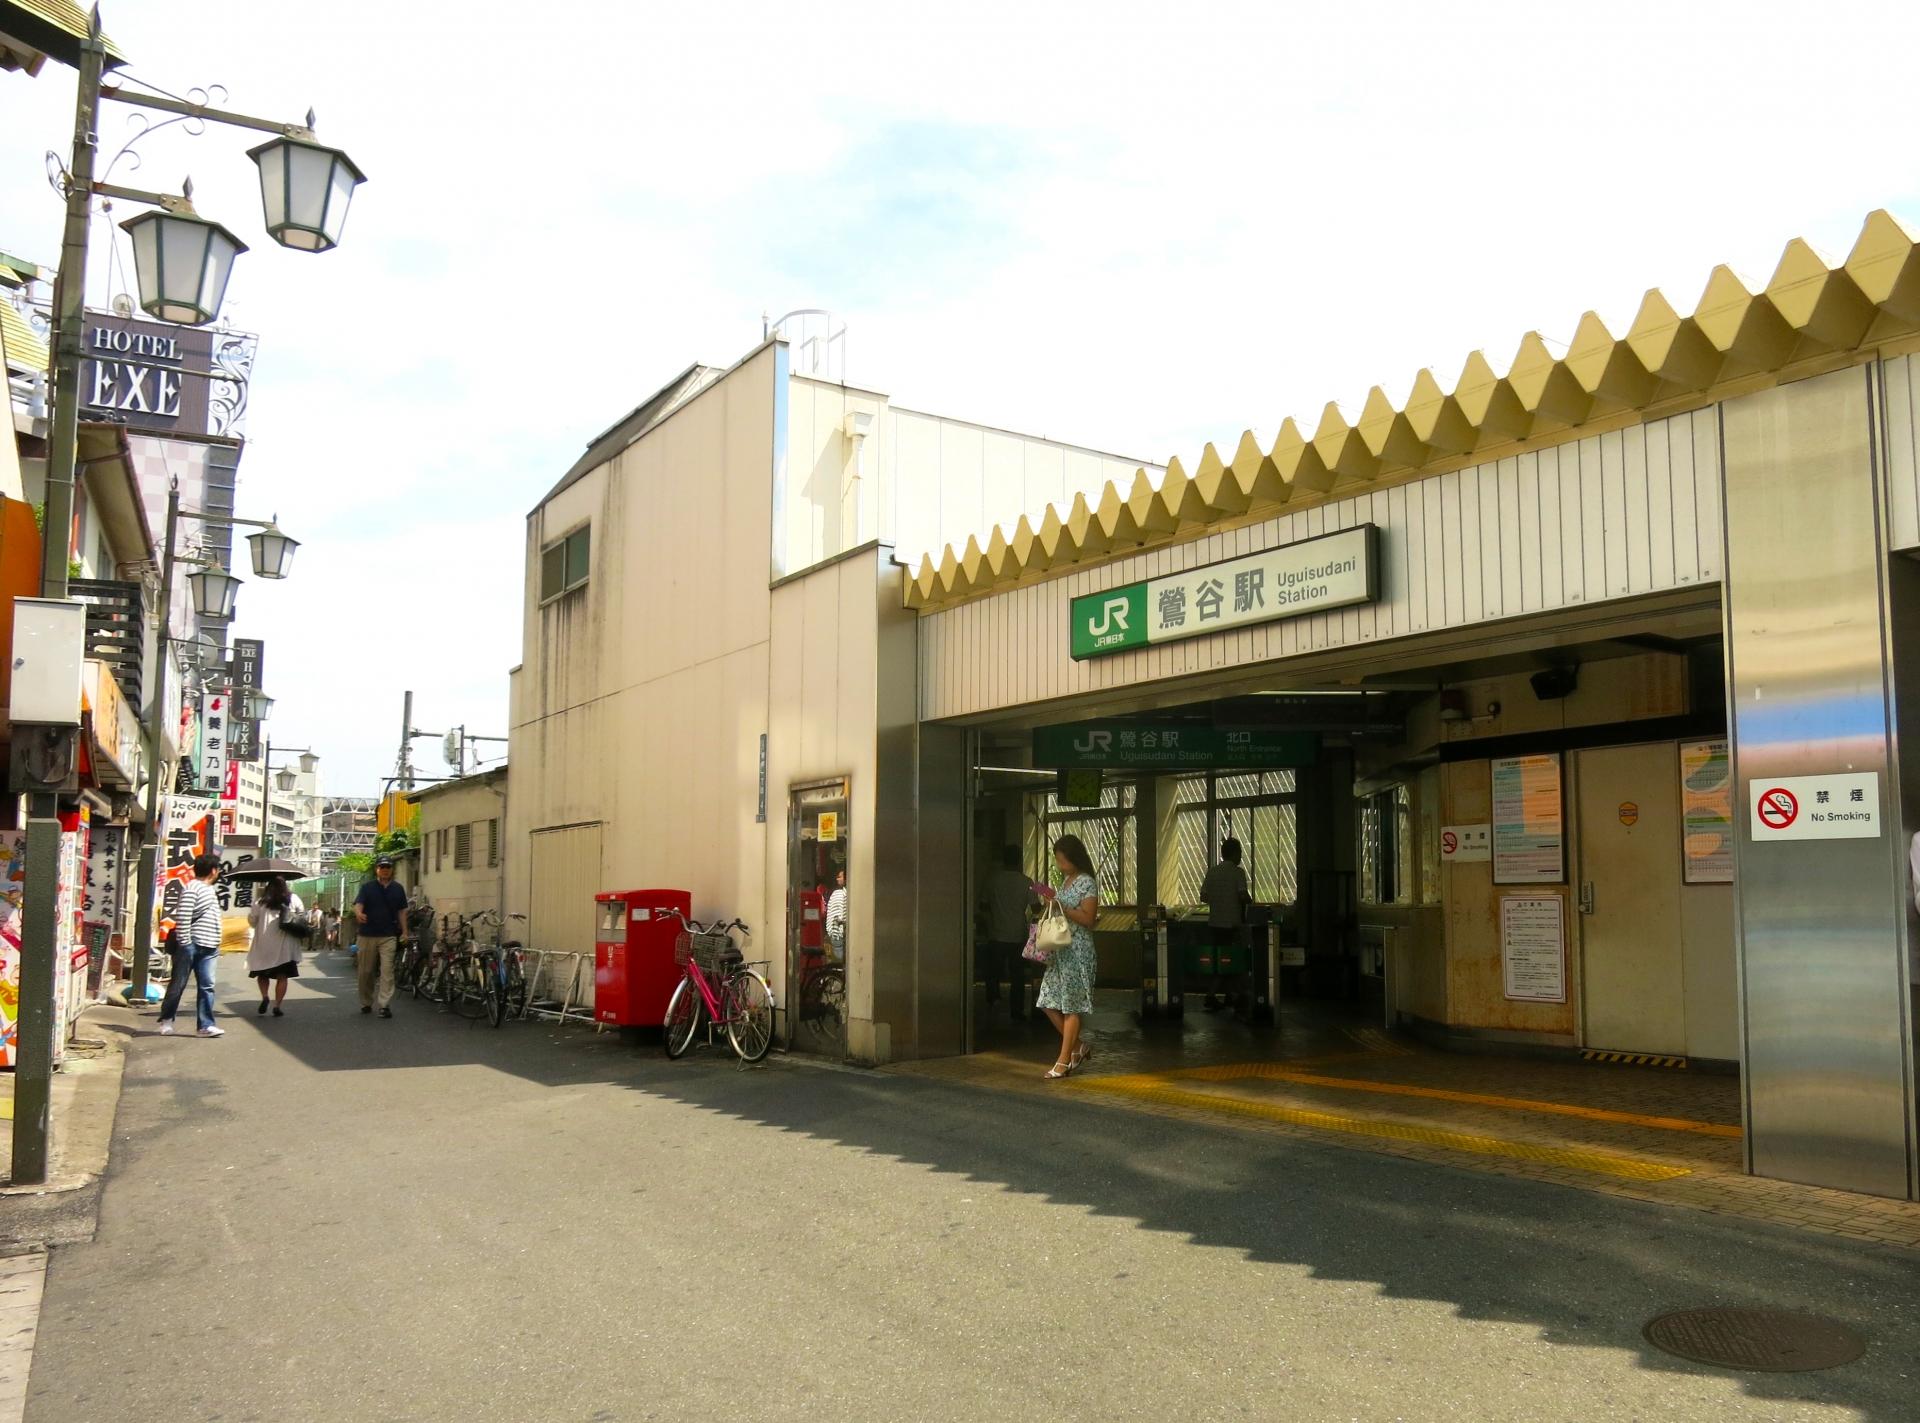 【JR山手線】「いらない駅」ランキング 3位「西日暮里」2位「新大久保」、1位はやっぱり「鶯谷」